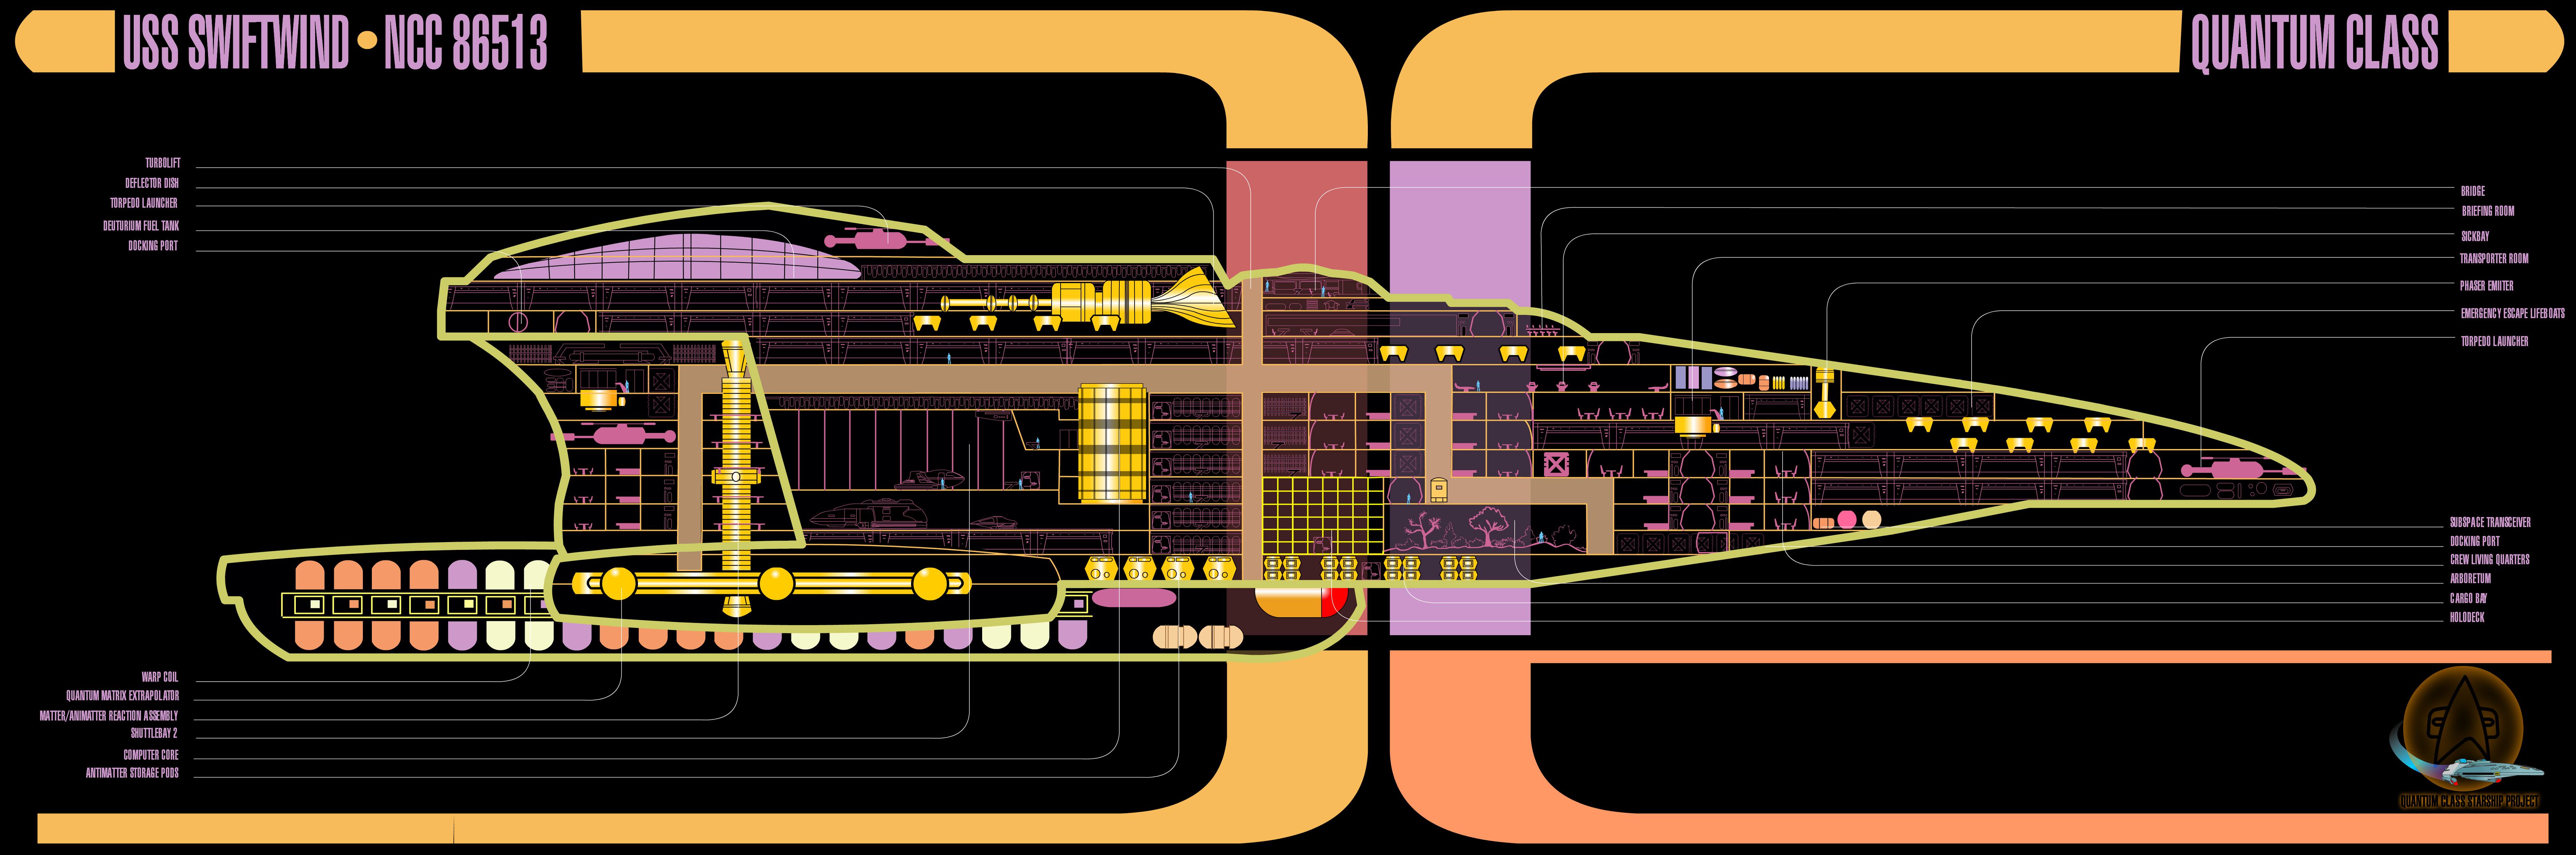 Star Trek Blueprints: Quantum Cl Starship Schematics - U.S.S. ... Starship Schematics on cylon fighter schematics, starbase schematics, macross sdf-1 schematics, space schematics, train schematics, mecha schematics,